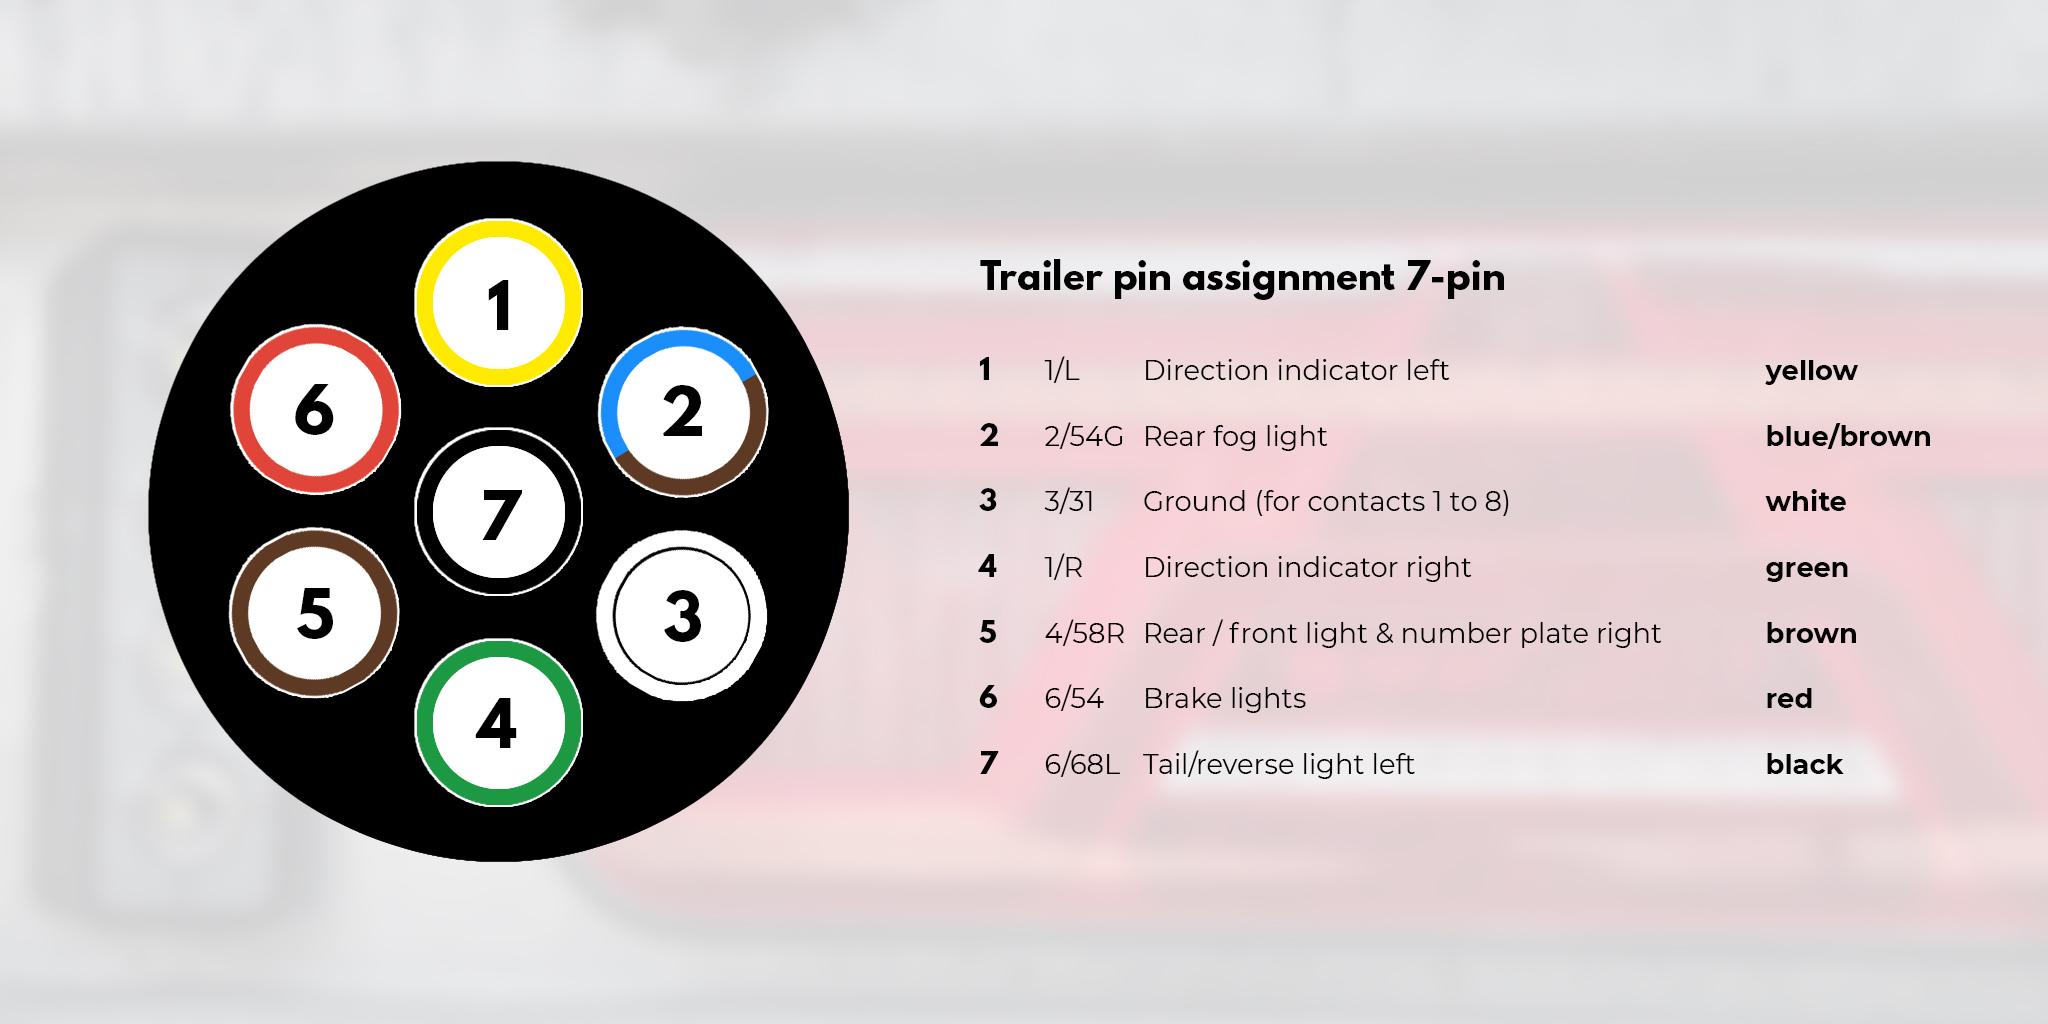 Trailer pin assignment 7-pin